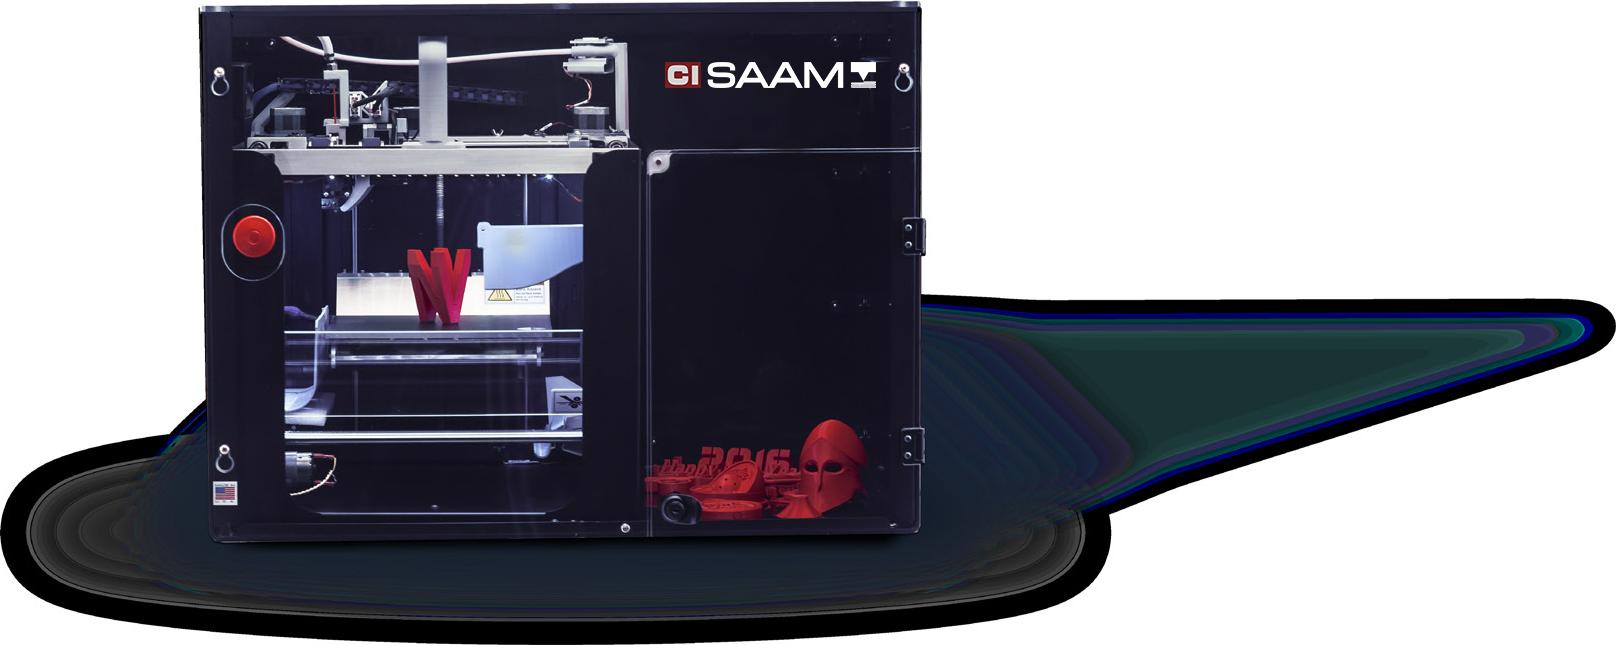 The SAAM system from Cincinnati Incorporated. Image via Cincinnati Incorporated.